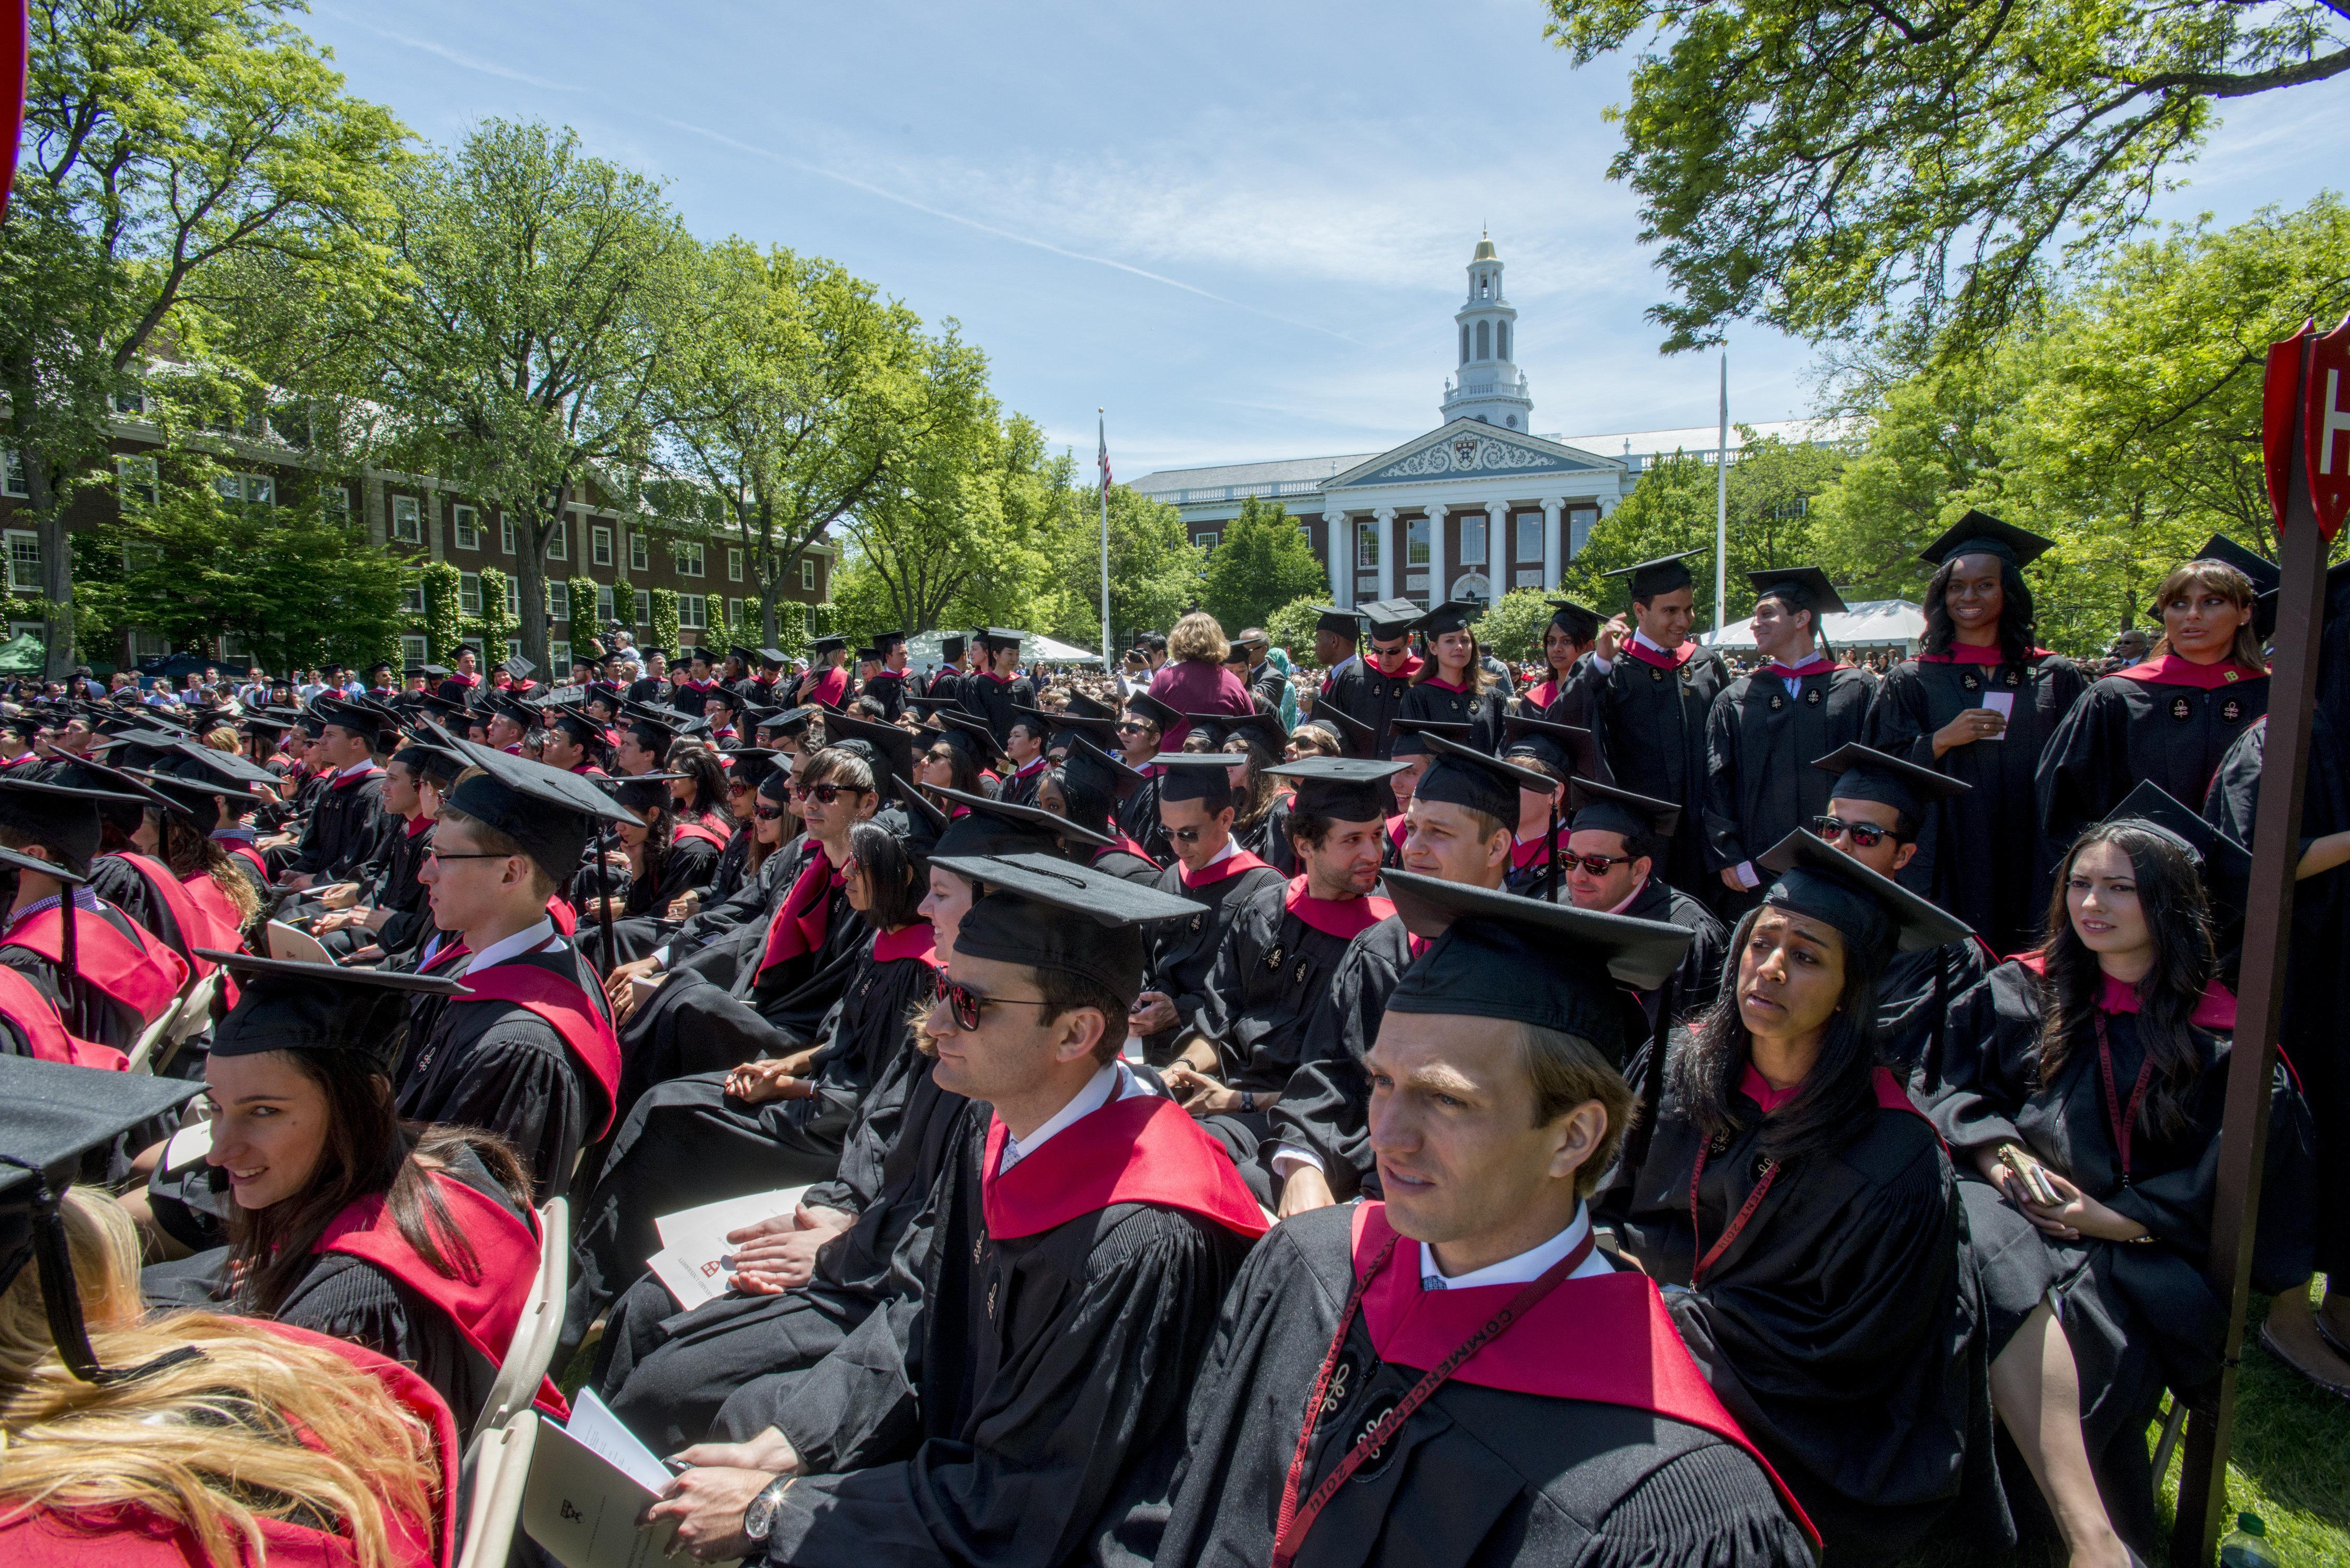 Harvard Business School commencement ceremonies on May 29, 2014.